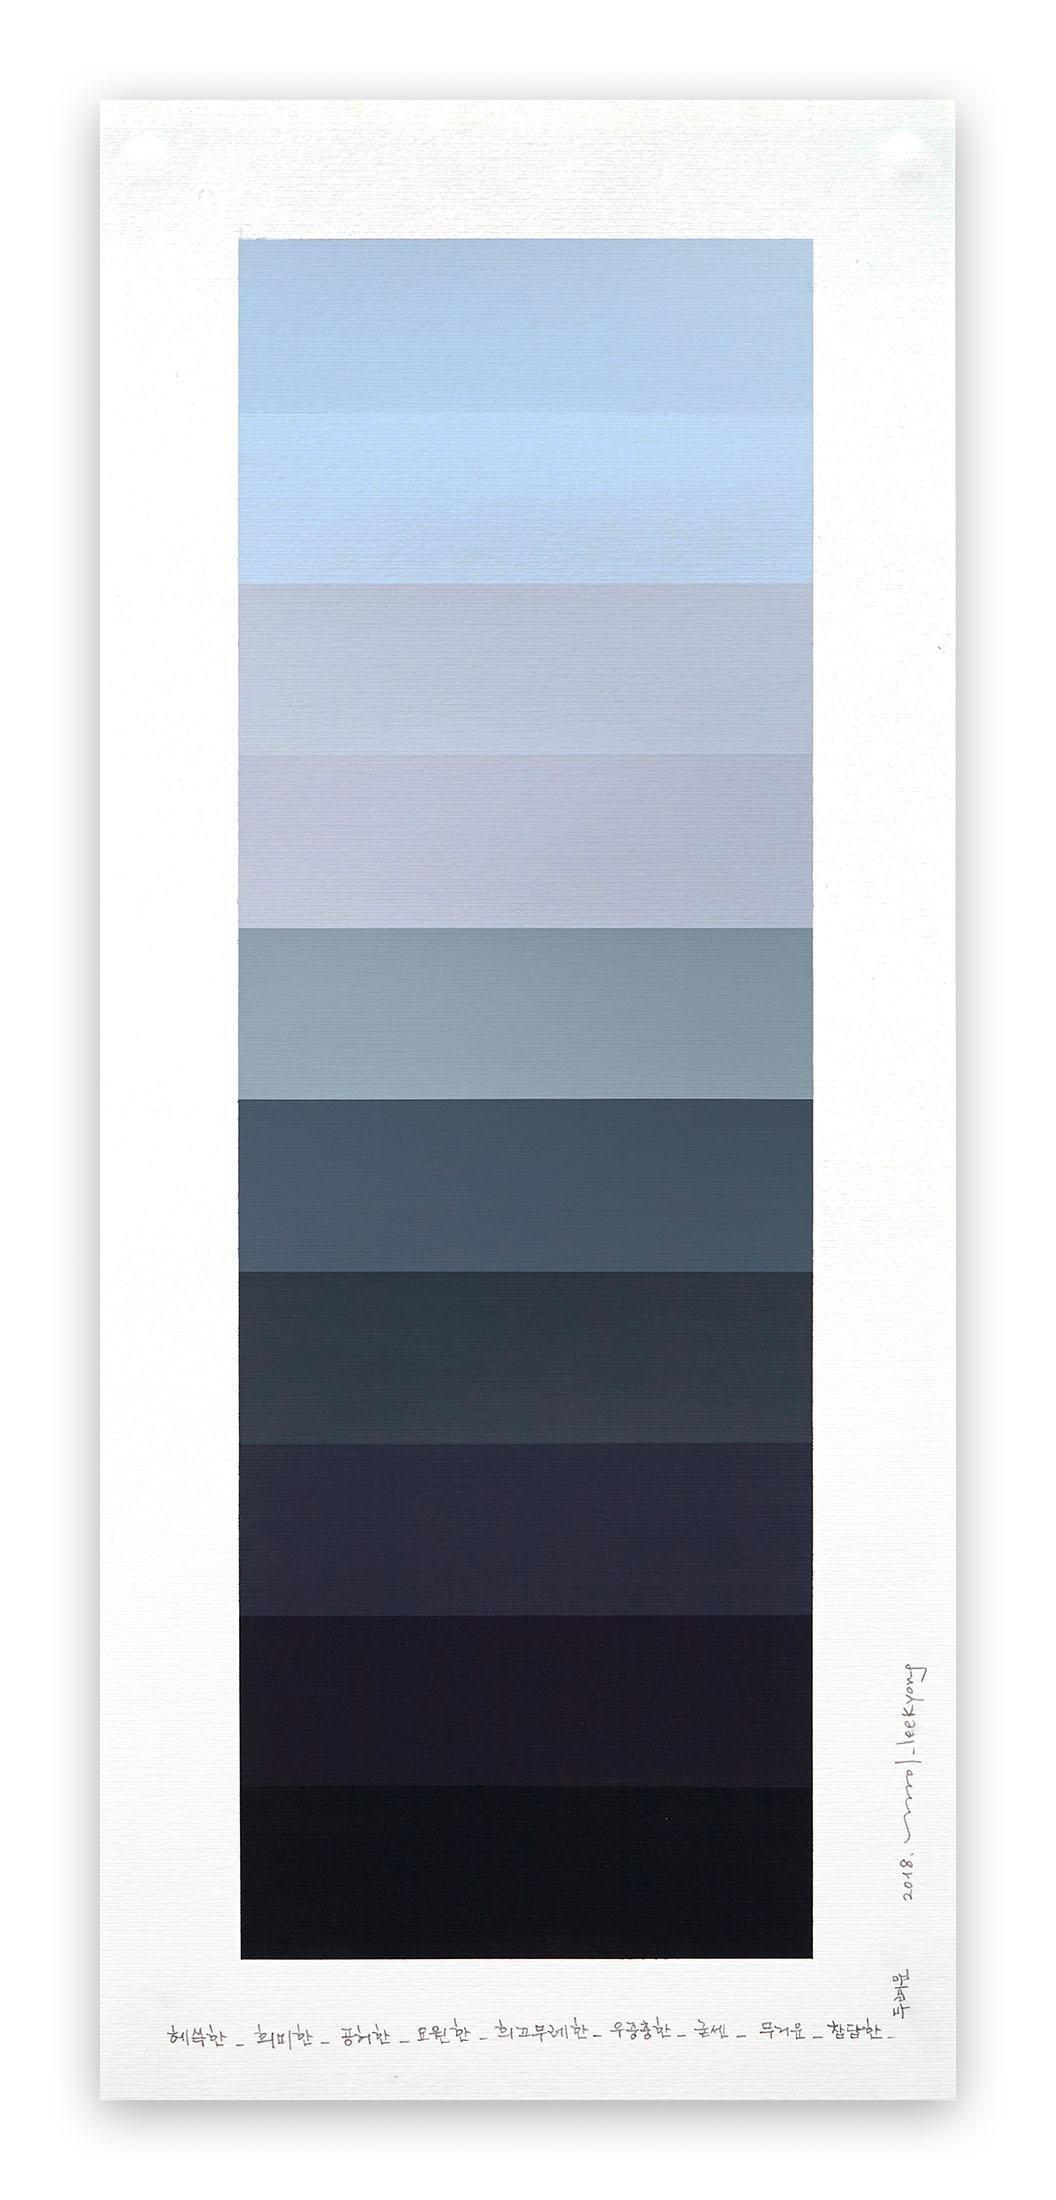 Emotional color chart 092